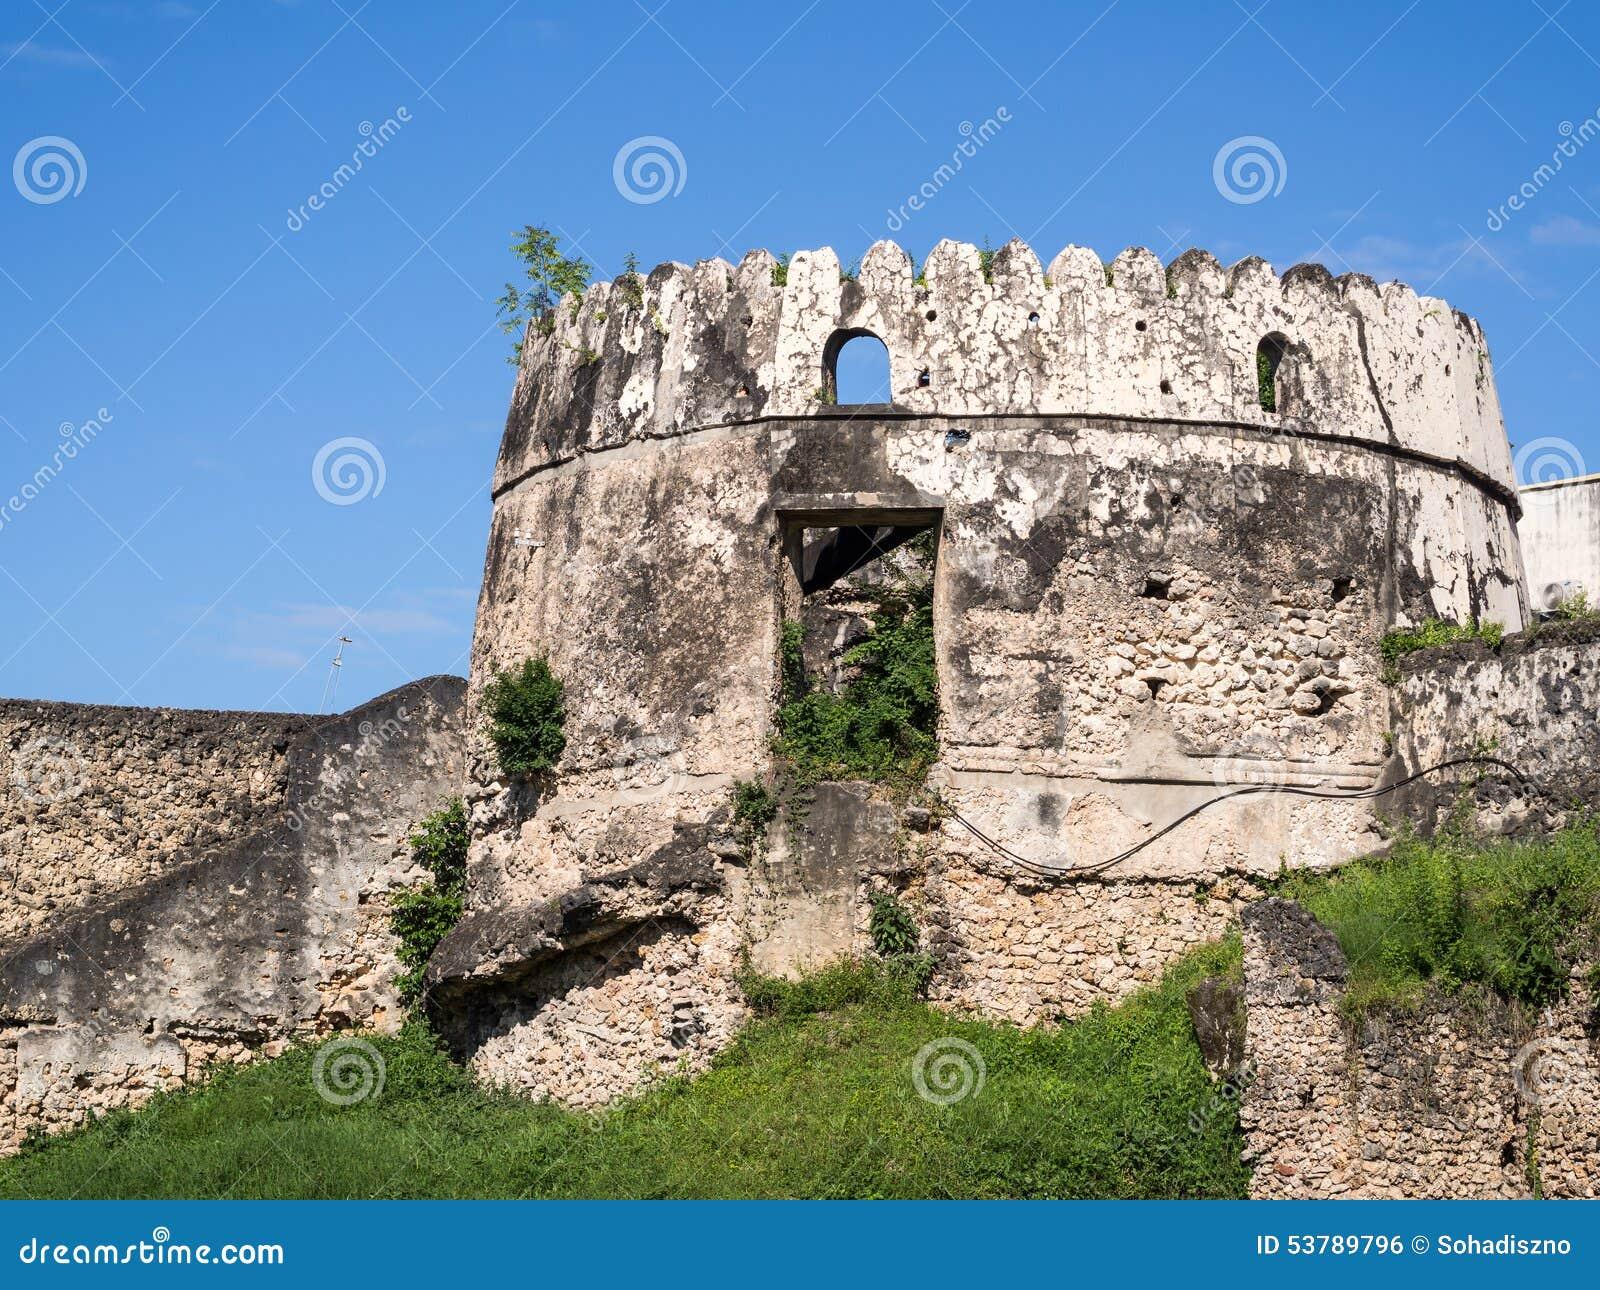 Vieux fort (Ngome Kongwe) dans la ville en pierre, Zanzibar